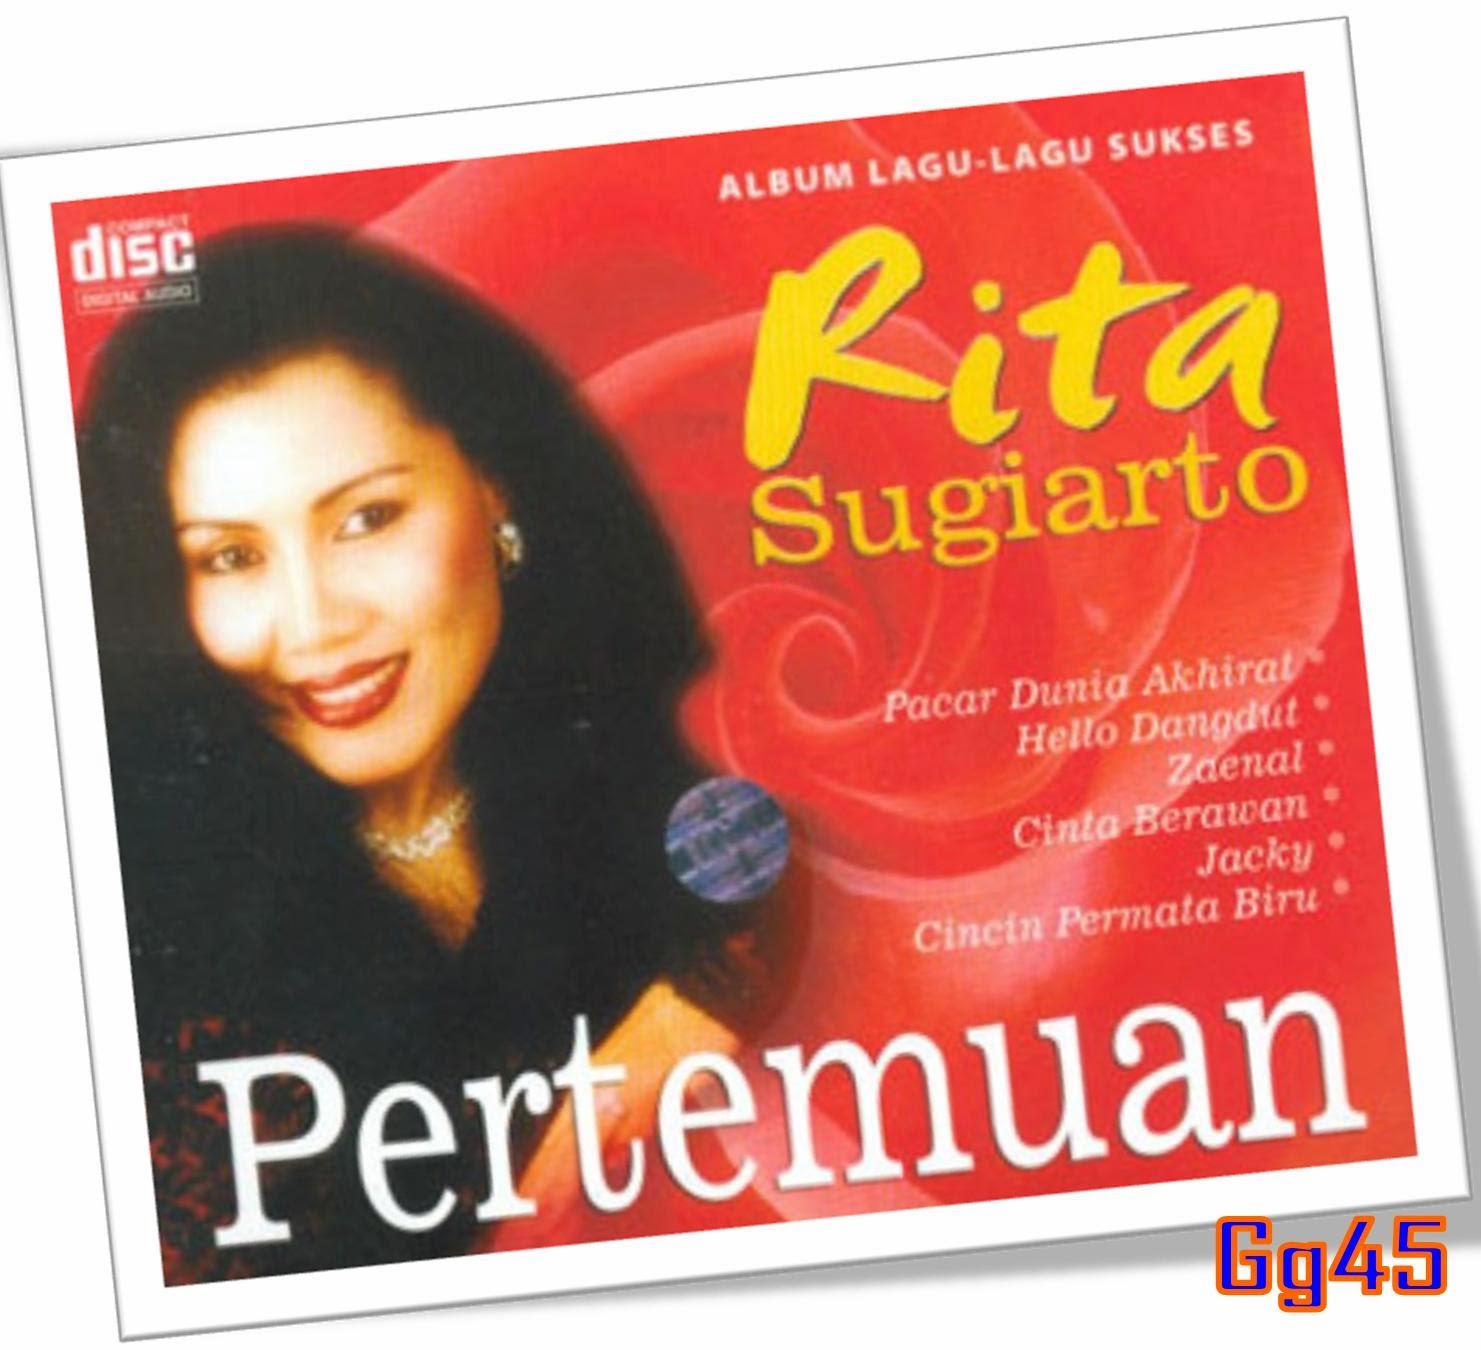 Dawload Lagu Mp3 Tamvan: Download Kumpulan Mp3 Lagu Rita Sugiarto Lengkap